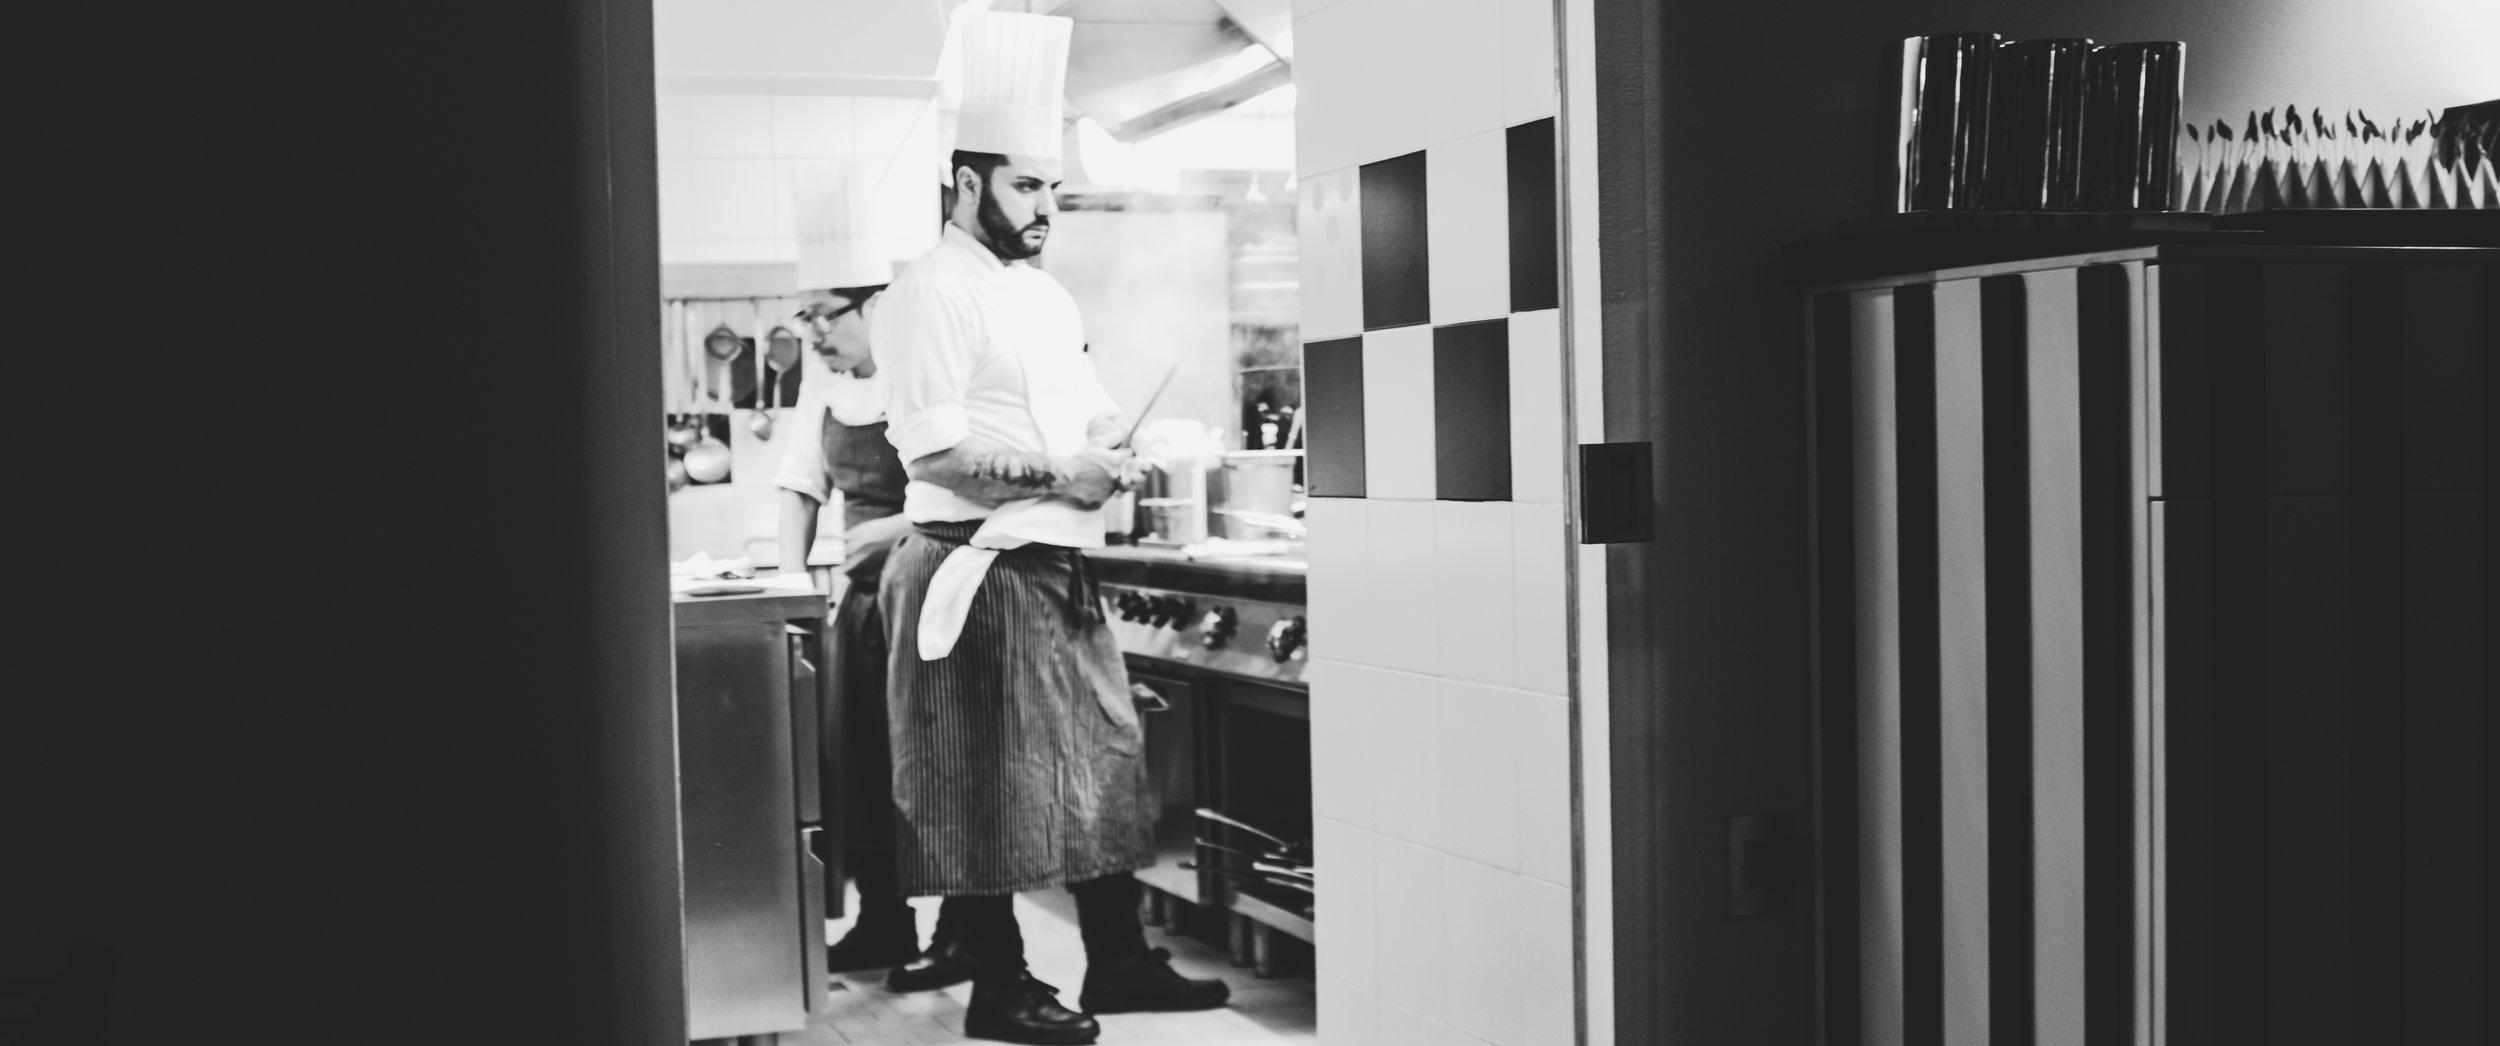 Felix Lo Basso. Vaizdas virtuvėje.  Felix Lo Basso. Kitchen scene.